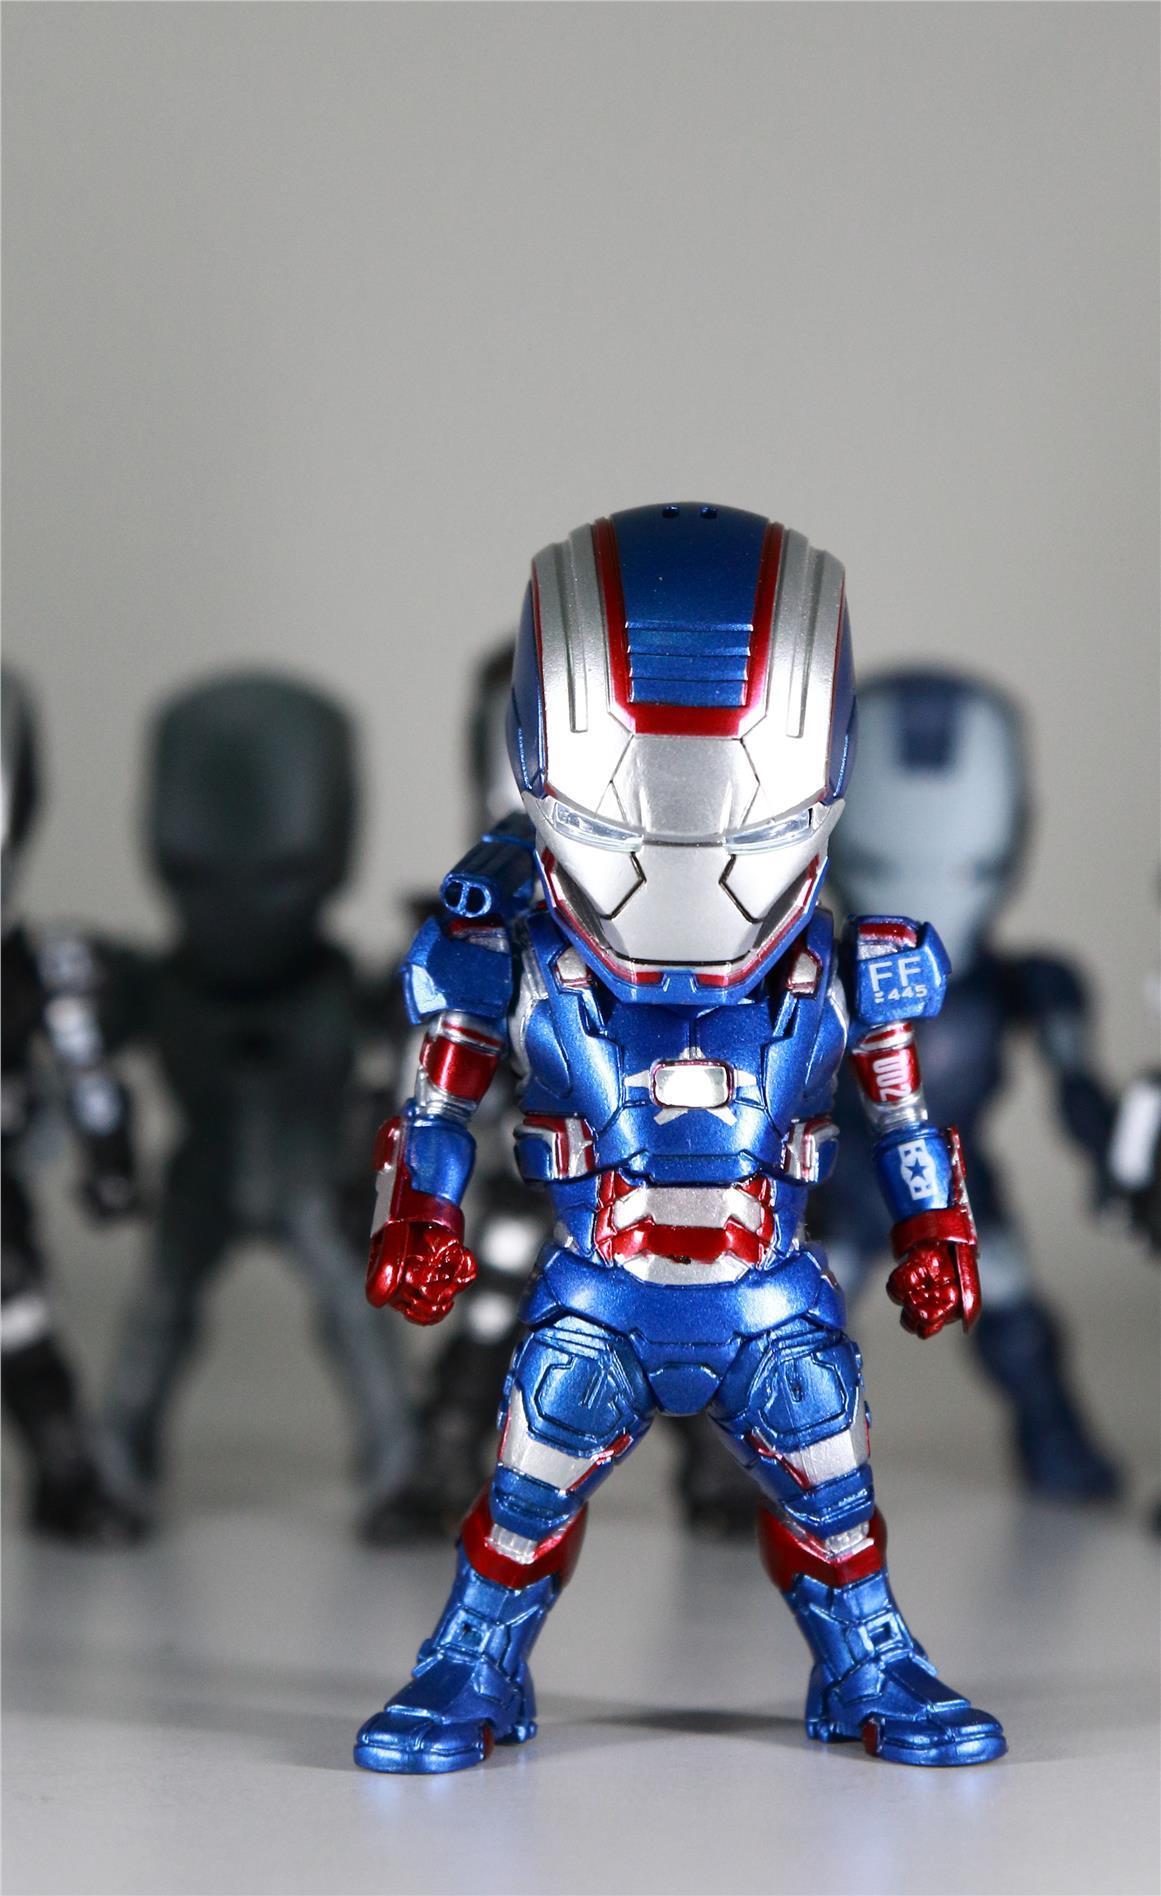 Iron Man 9cm IRON PATRIOT with LED light (Chest, Eye)